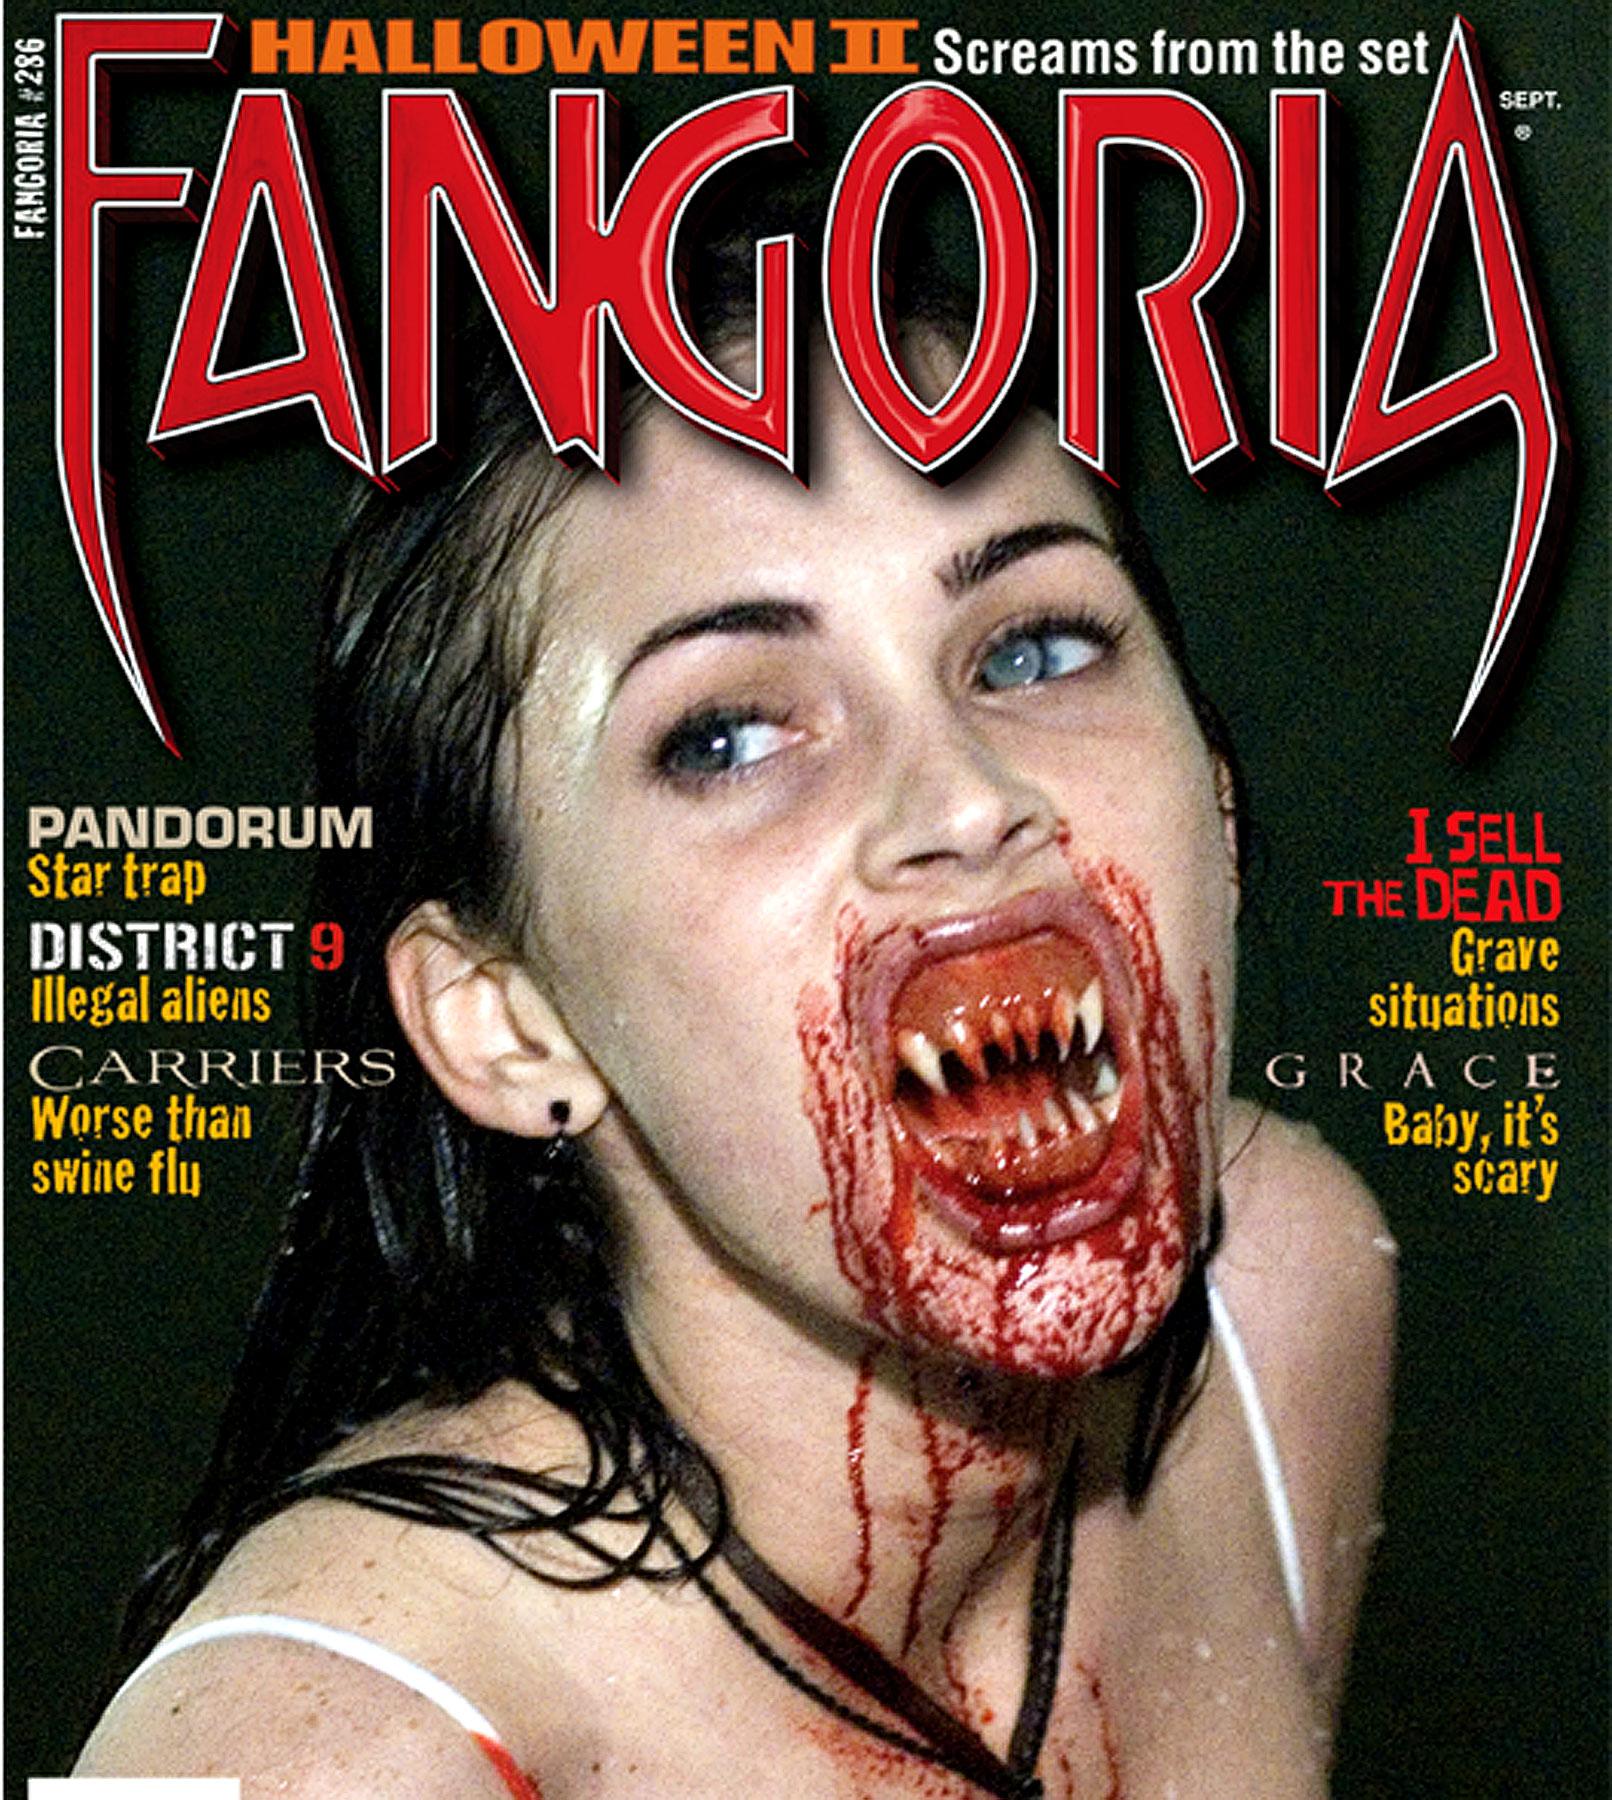 Megan Fox Puts the 'Fang' in 'Fangoria'